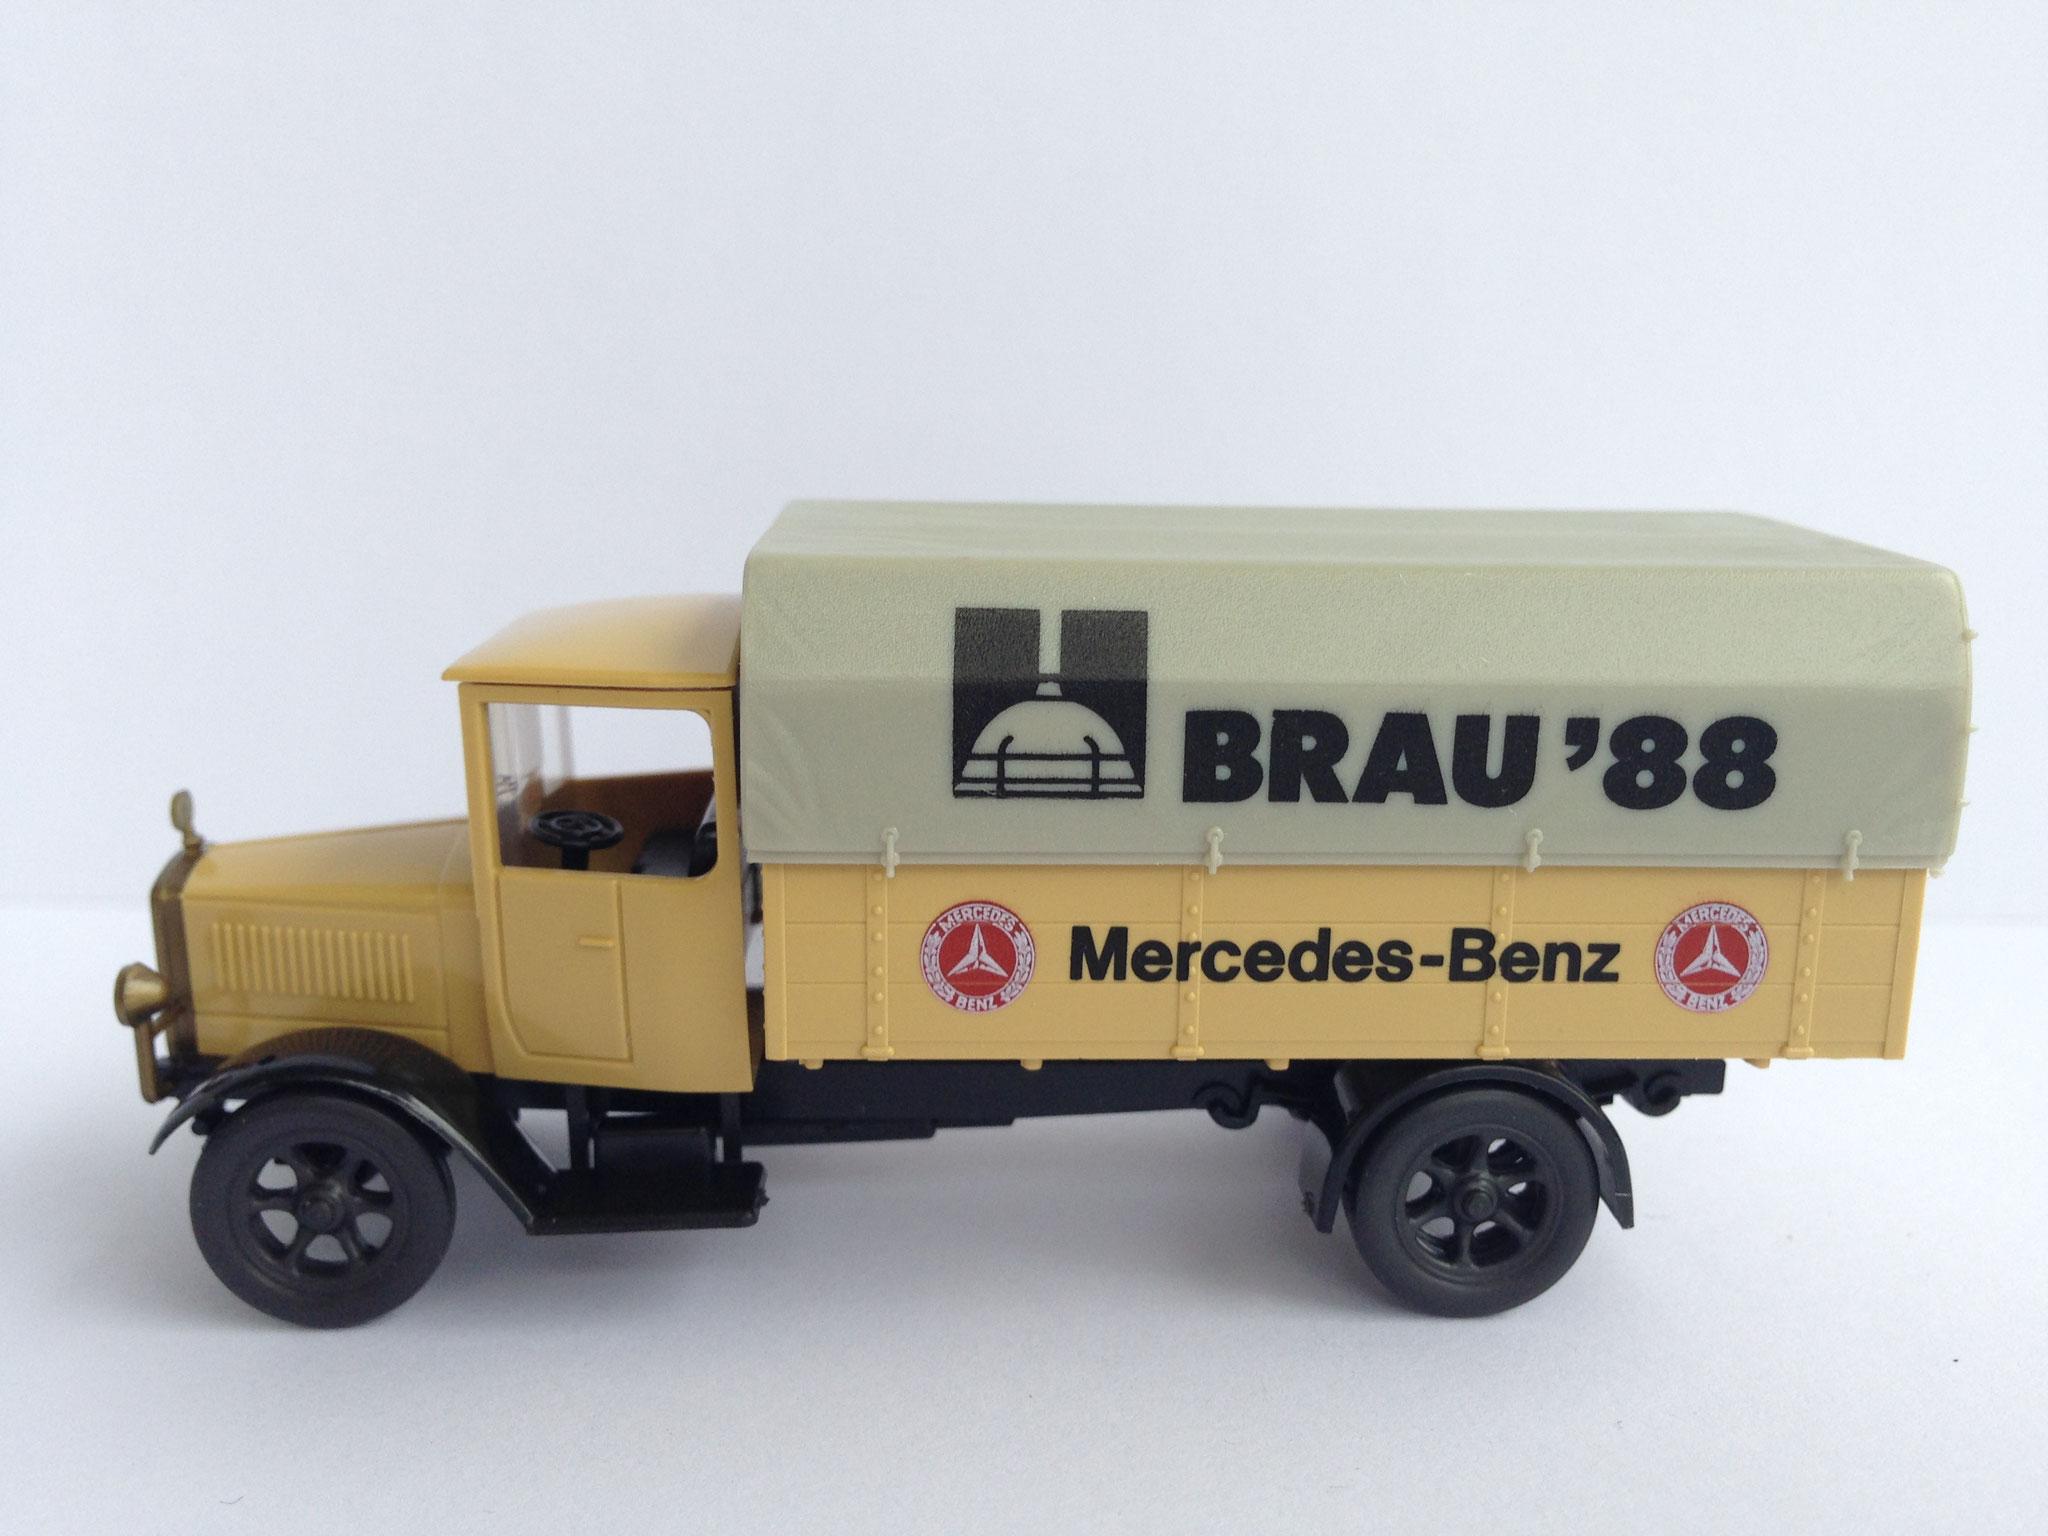 Mercedes L5 Bierwagen Brau 88 (MB-Museum), 1988